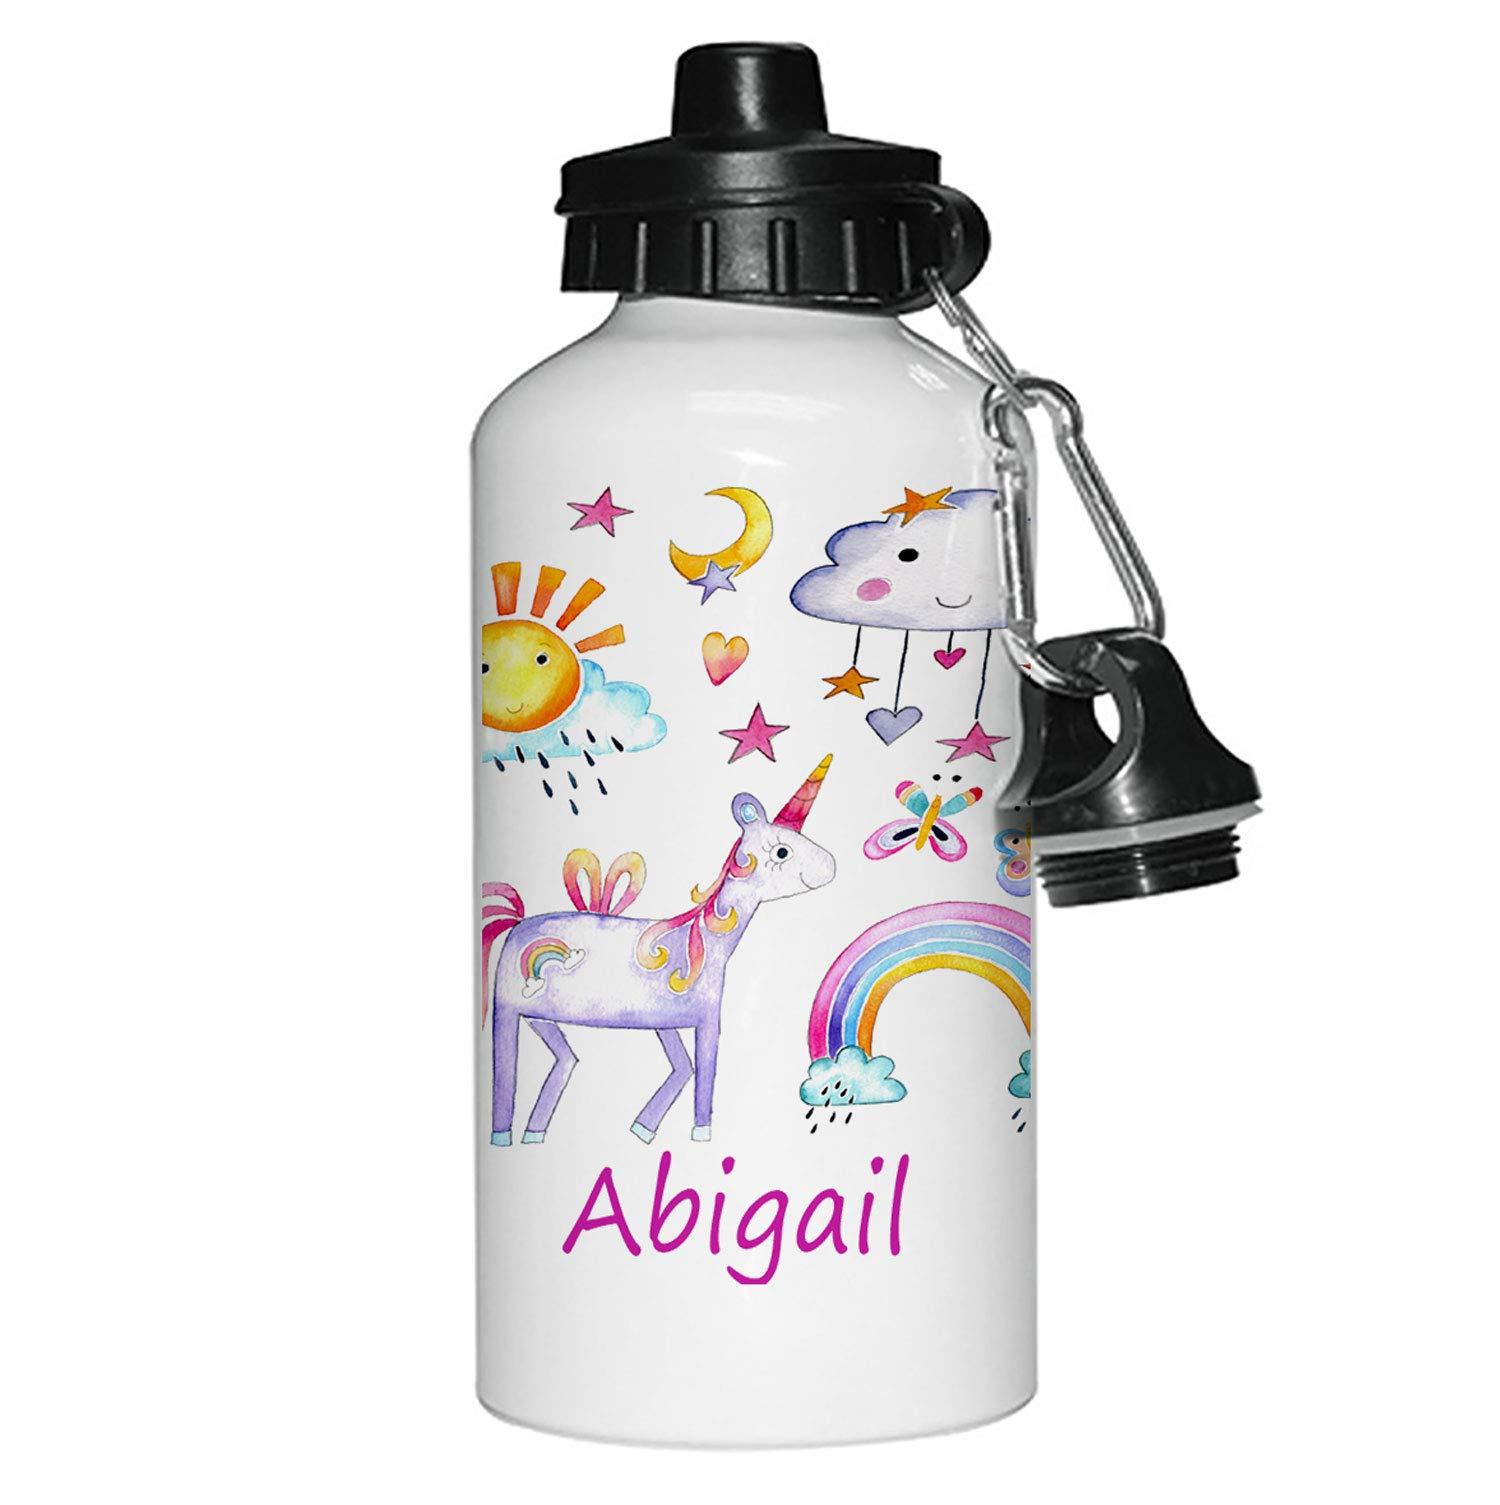 Personalised-Unicorn-Girls-Drinks-Water-Bottle-Girls-Unicorn-Gifts